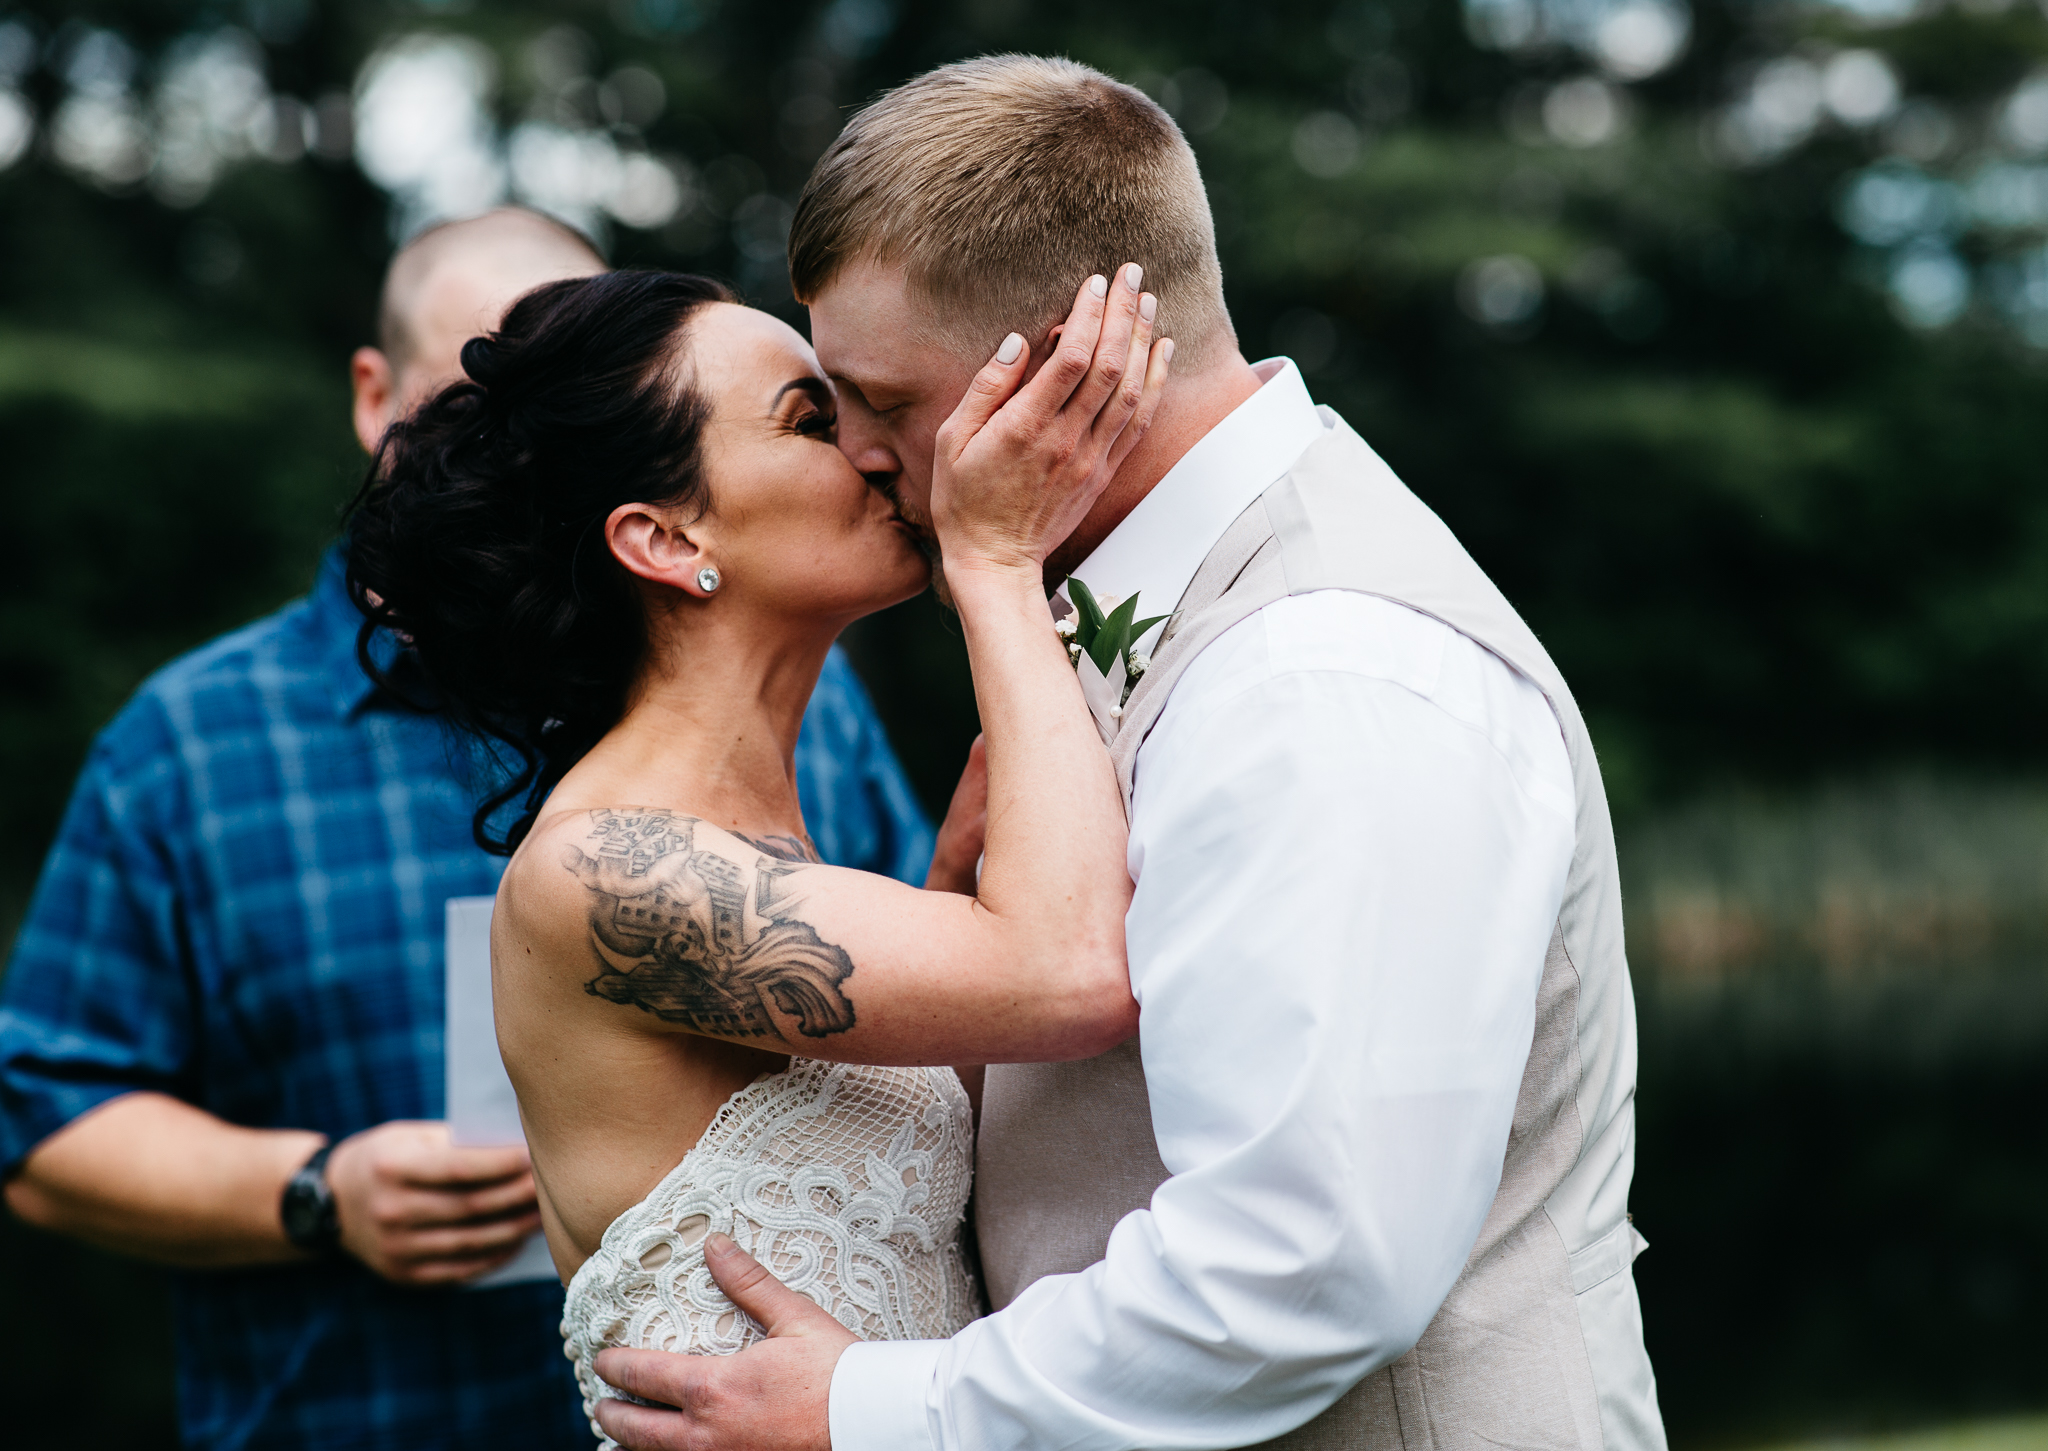 maine-bride-groom-wedding-first kiss-barn-summer-photography.jpg